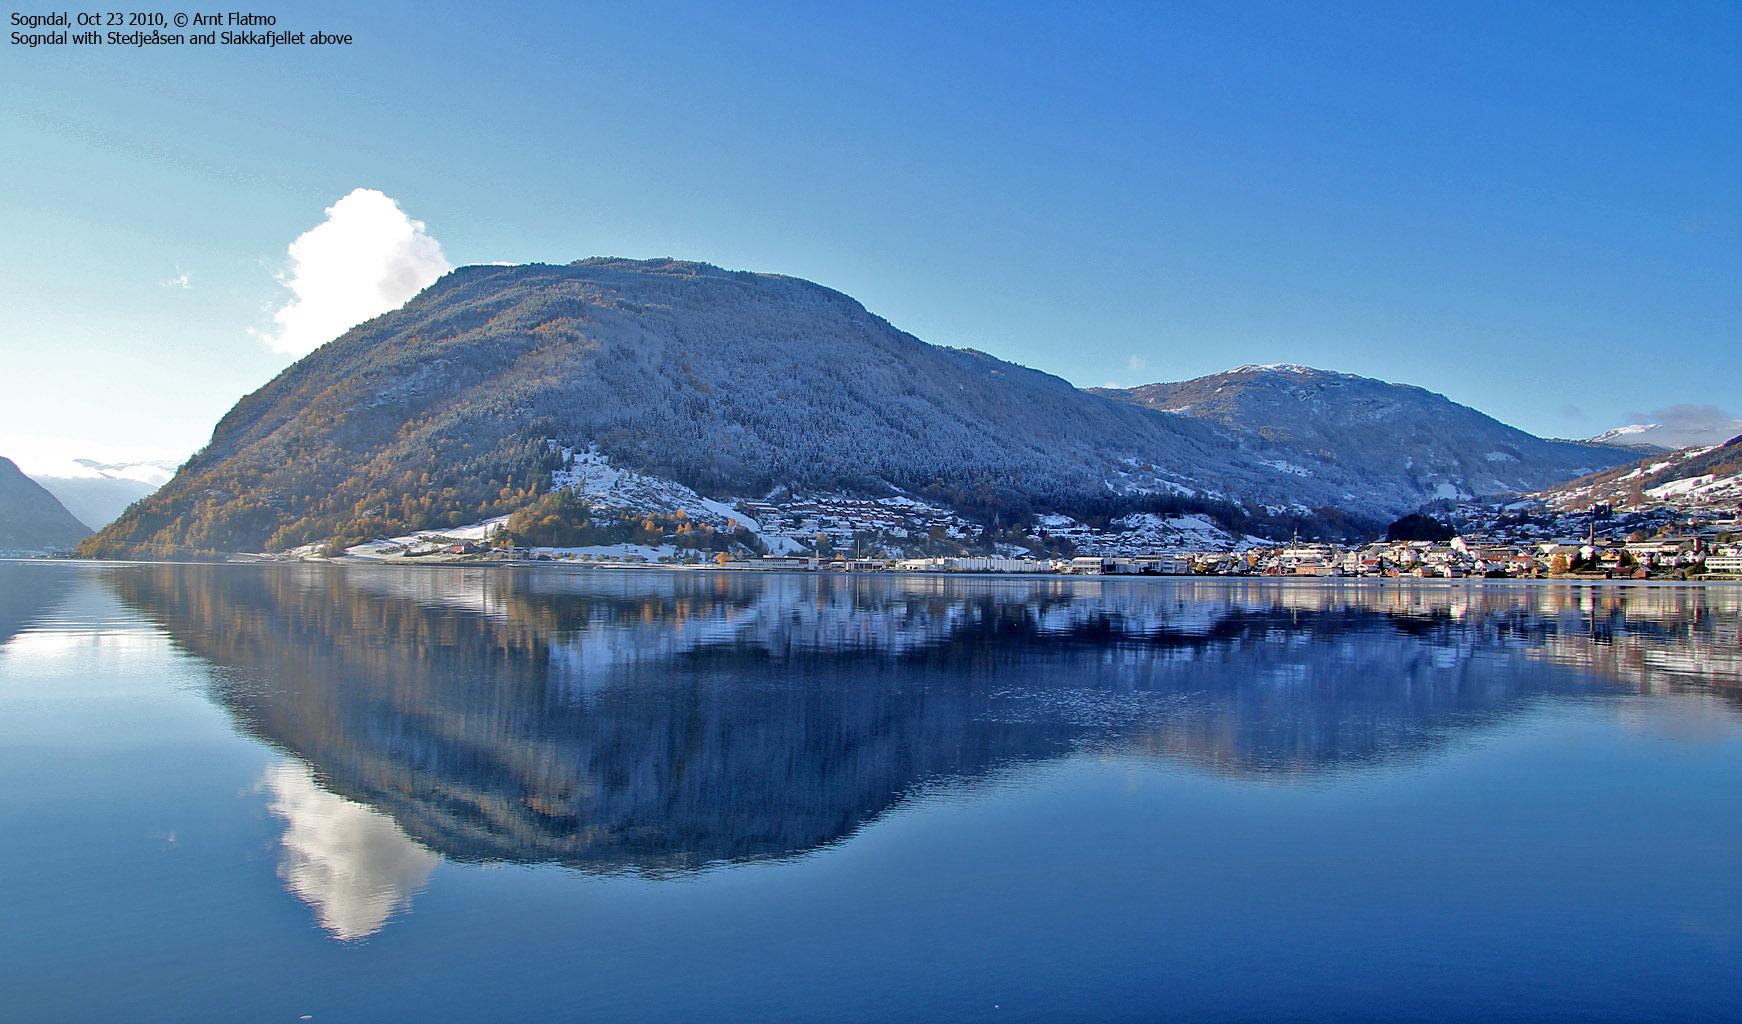 Les montagnes Slakka_65sogndal